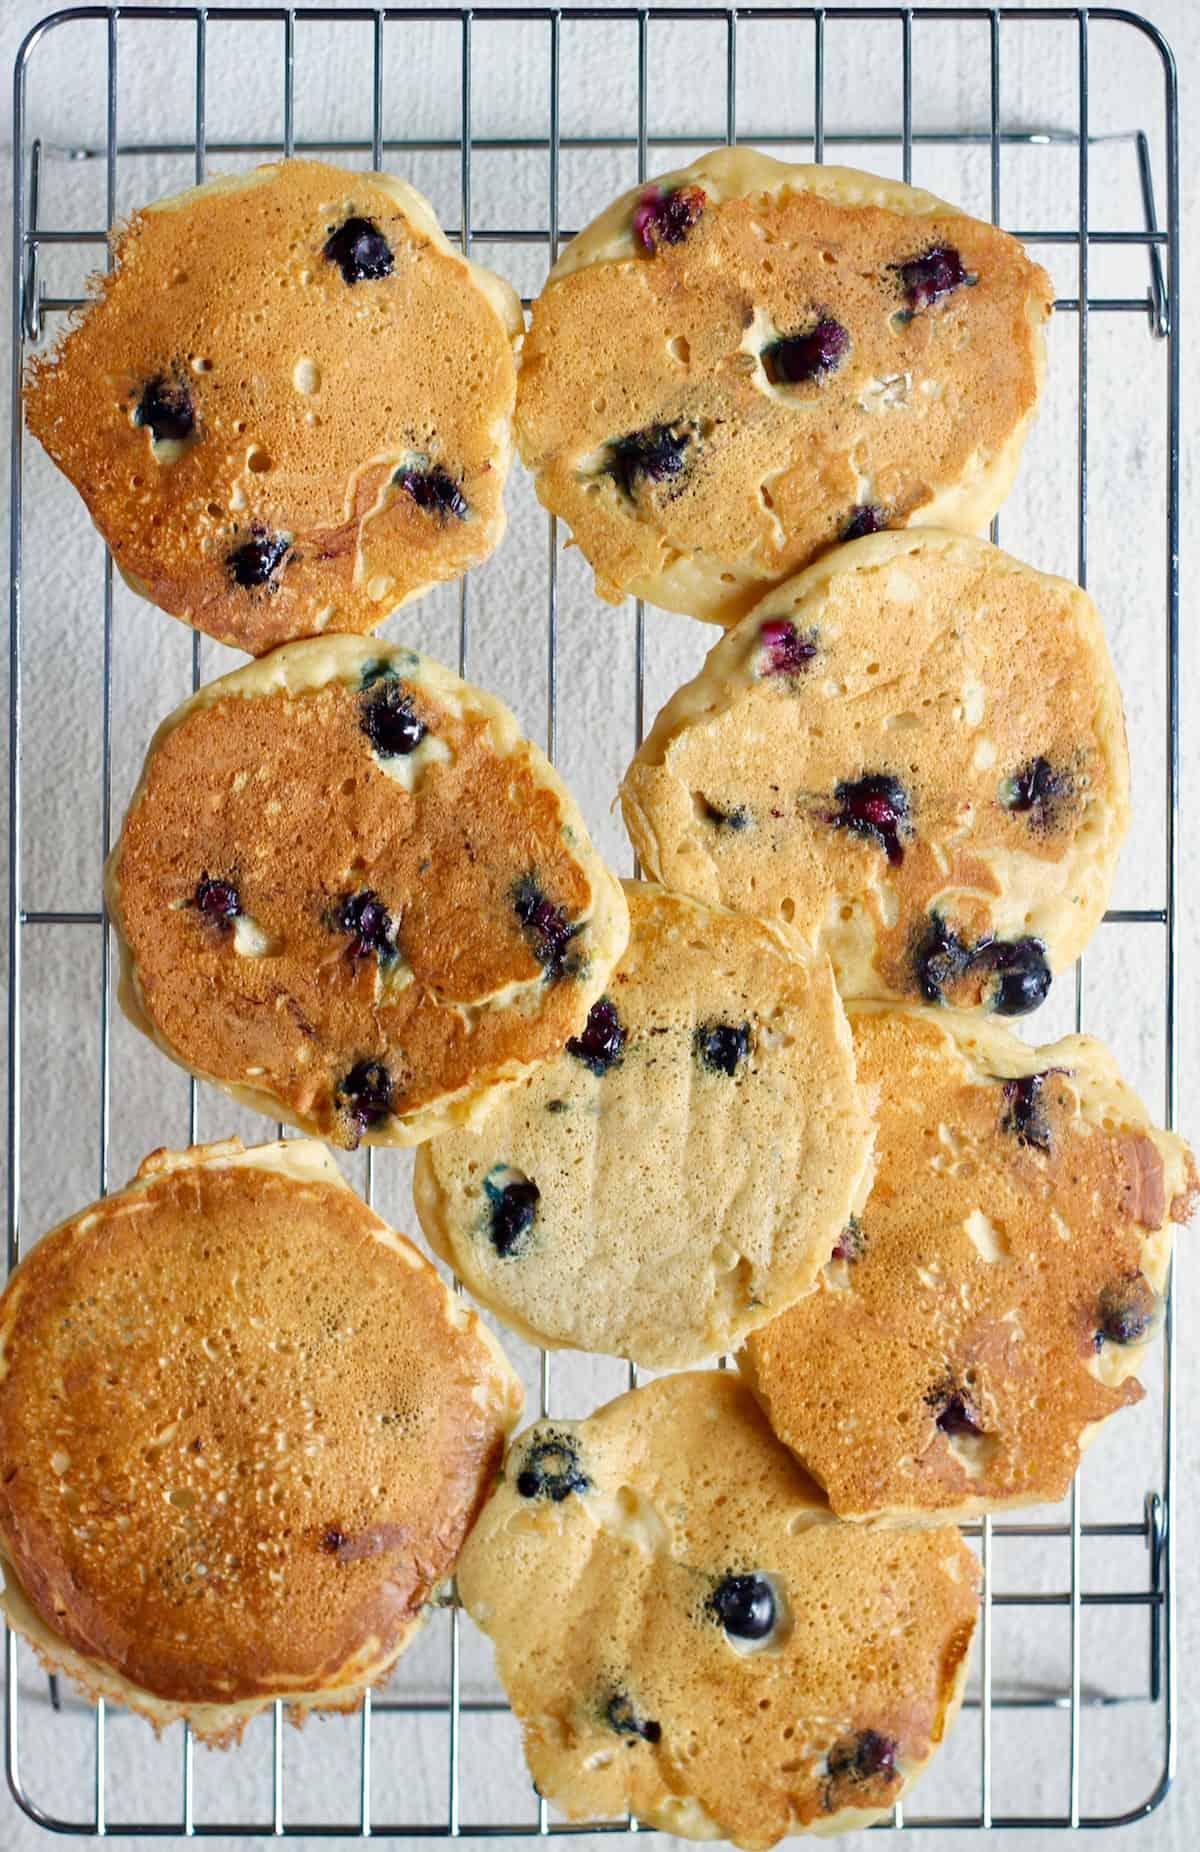 lemon blueberry pancakes on cooling rack